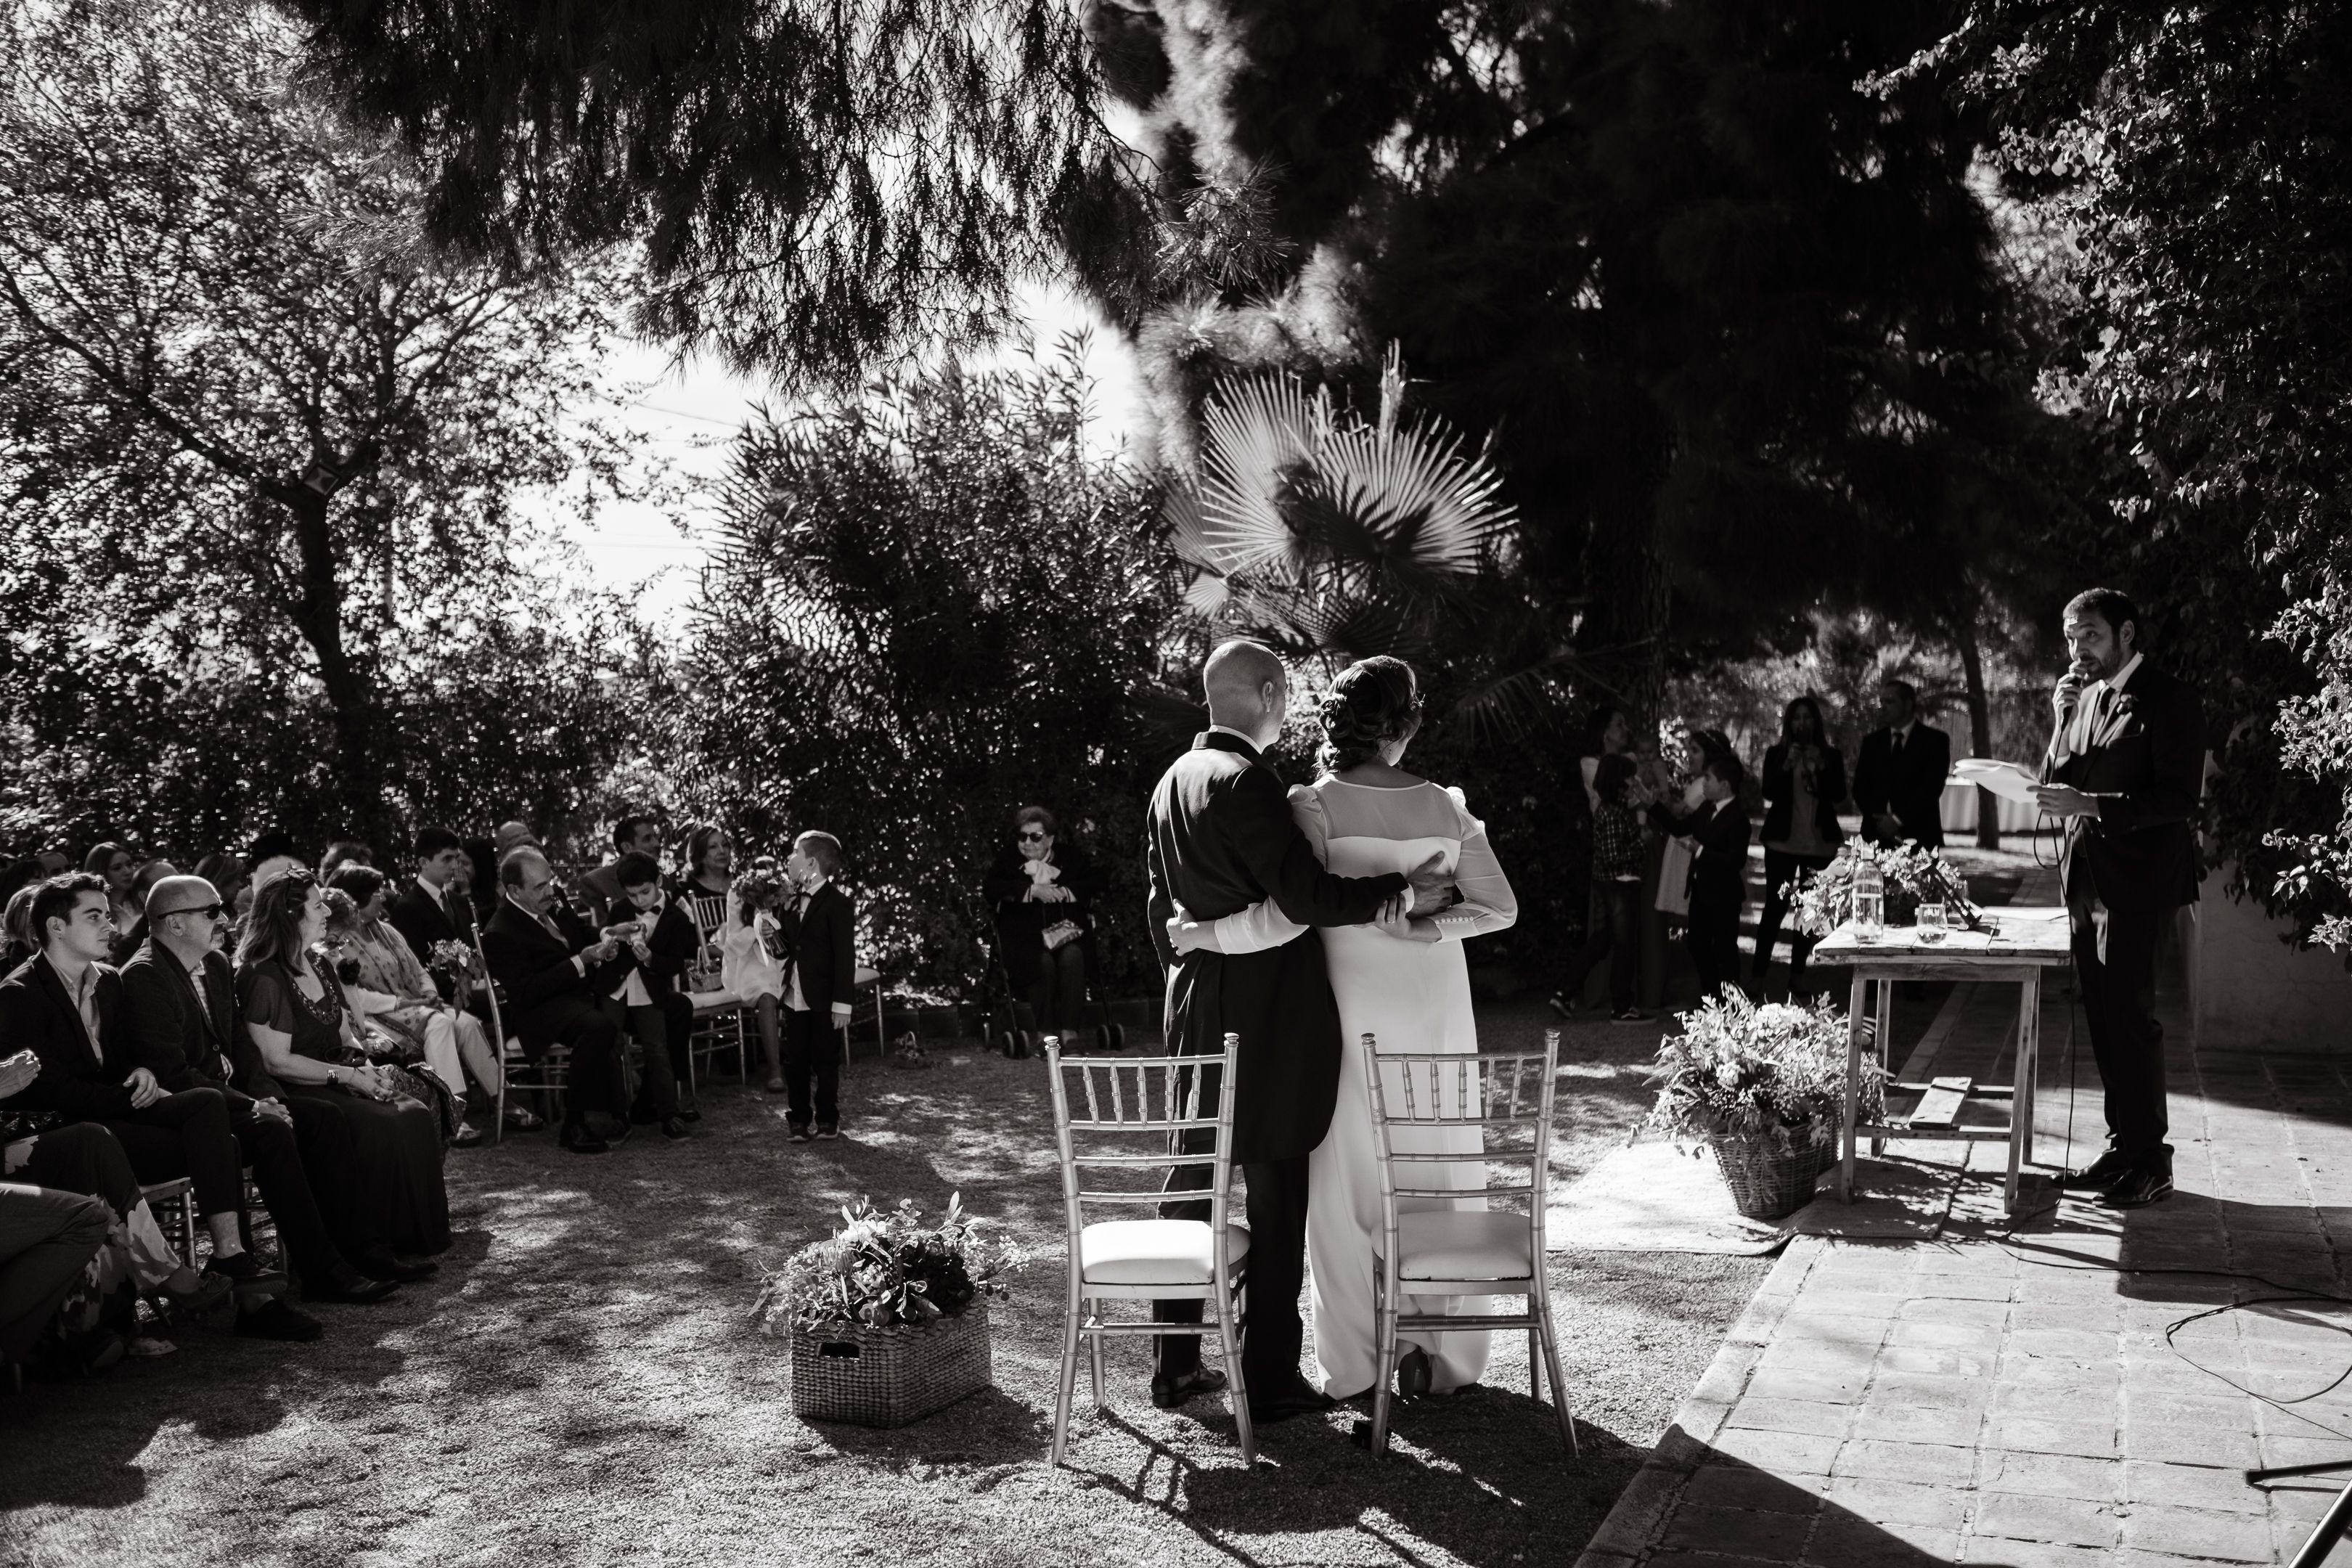 c67bb4e0 Ceremonia civil al aire libre. Bodas de otoño. Wedding Planner Murcia, bodas  en